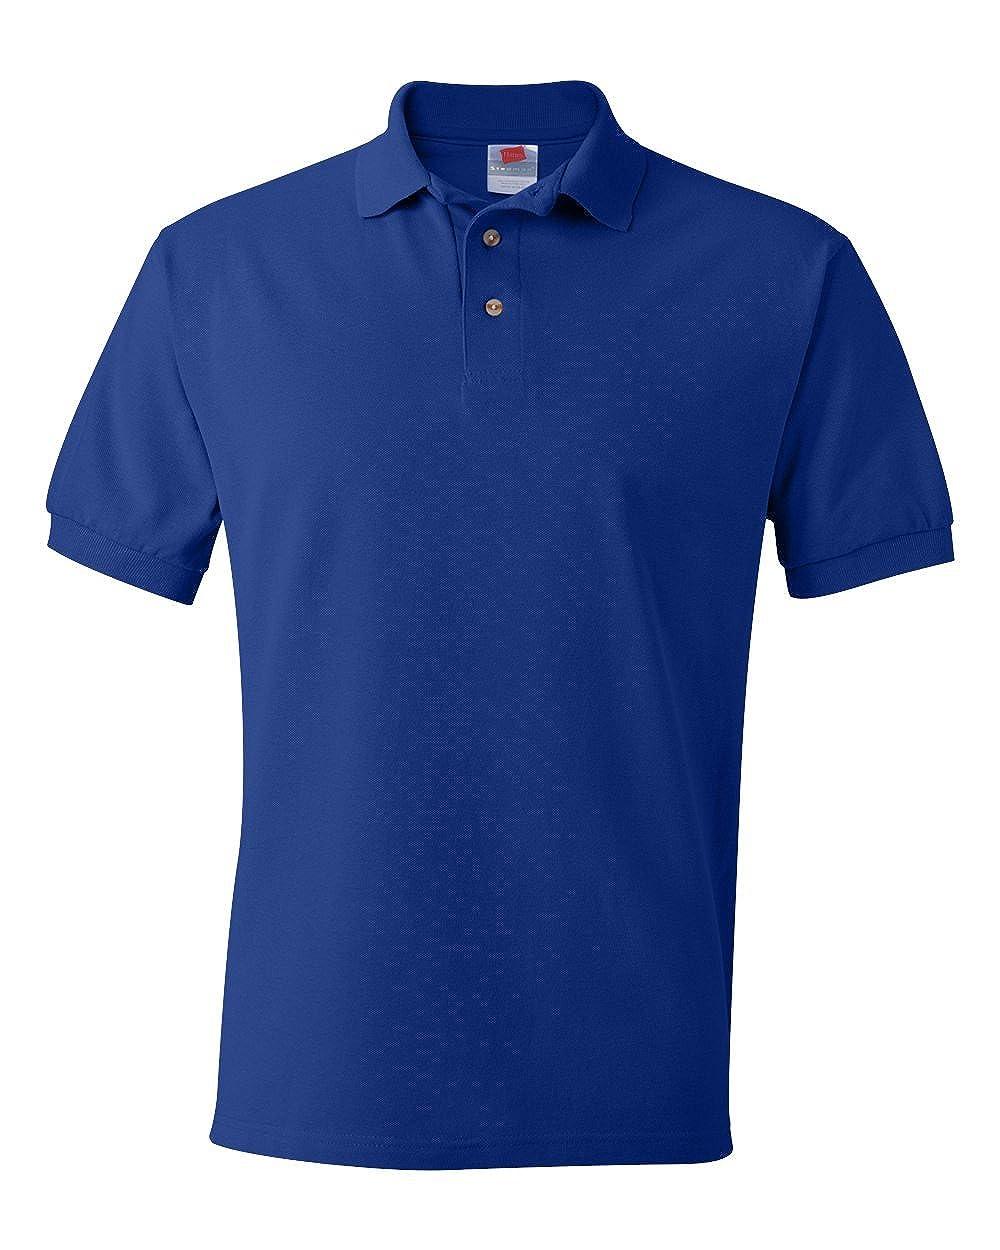 Hanes Hombres Comfortblend Ecosmart Jersey Polo - Pequeña Granate ...